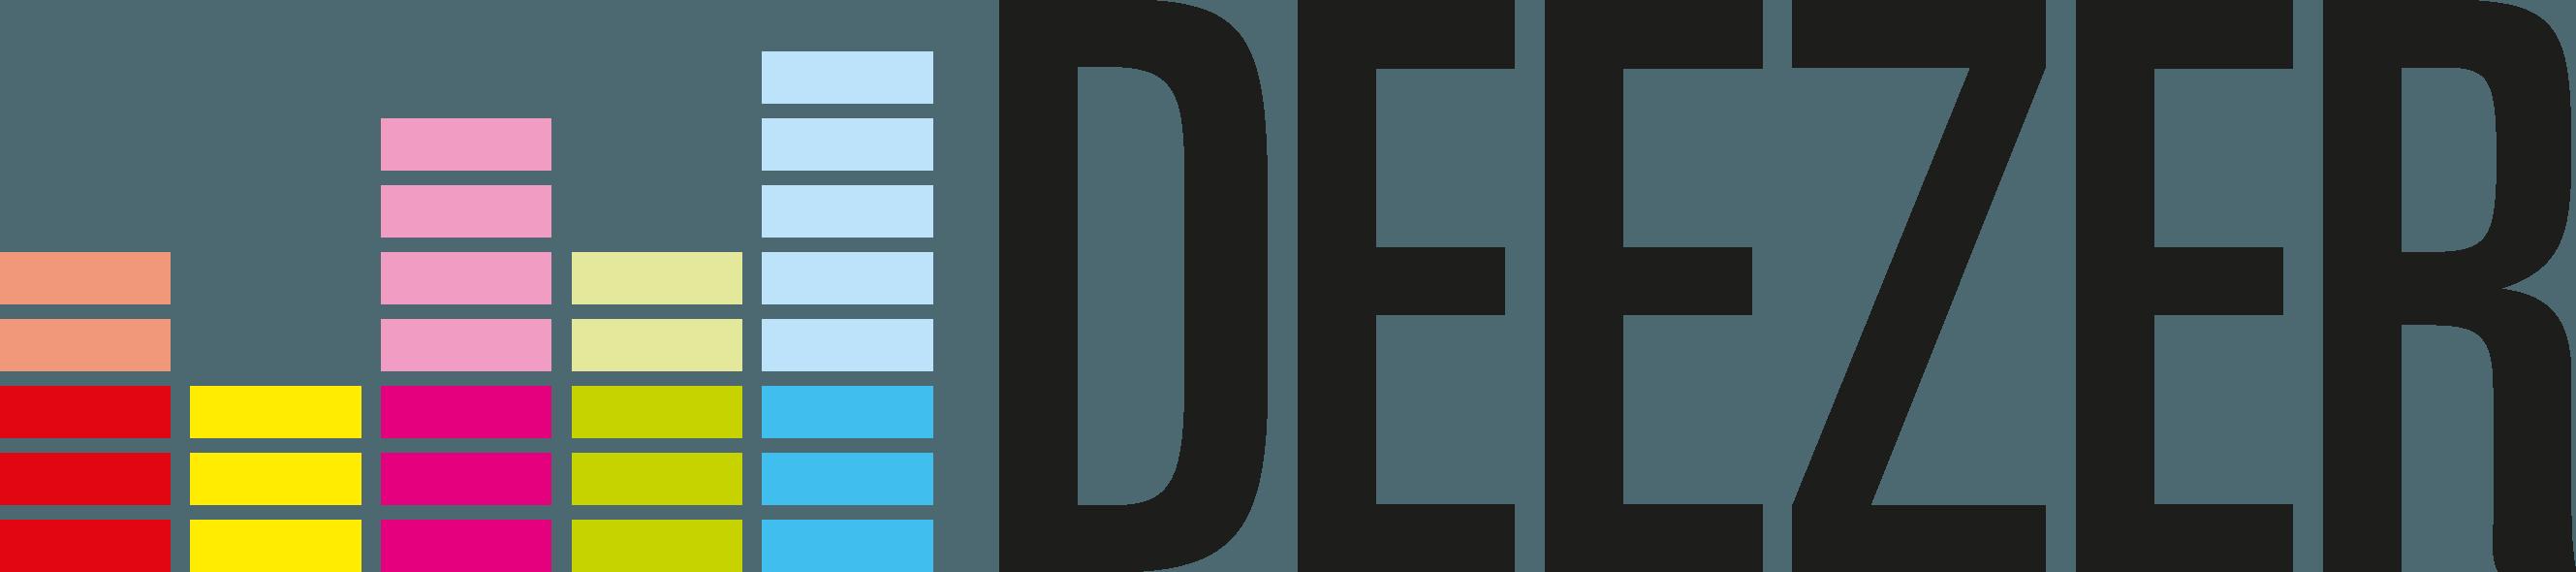 Deezer Logo [PDF] Vector EPS Free Download, Logo, Icons, Brand Emblems